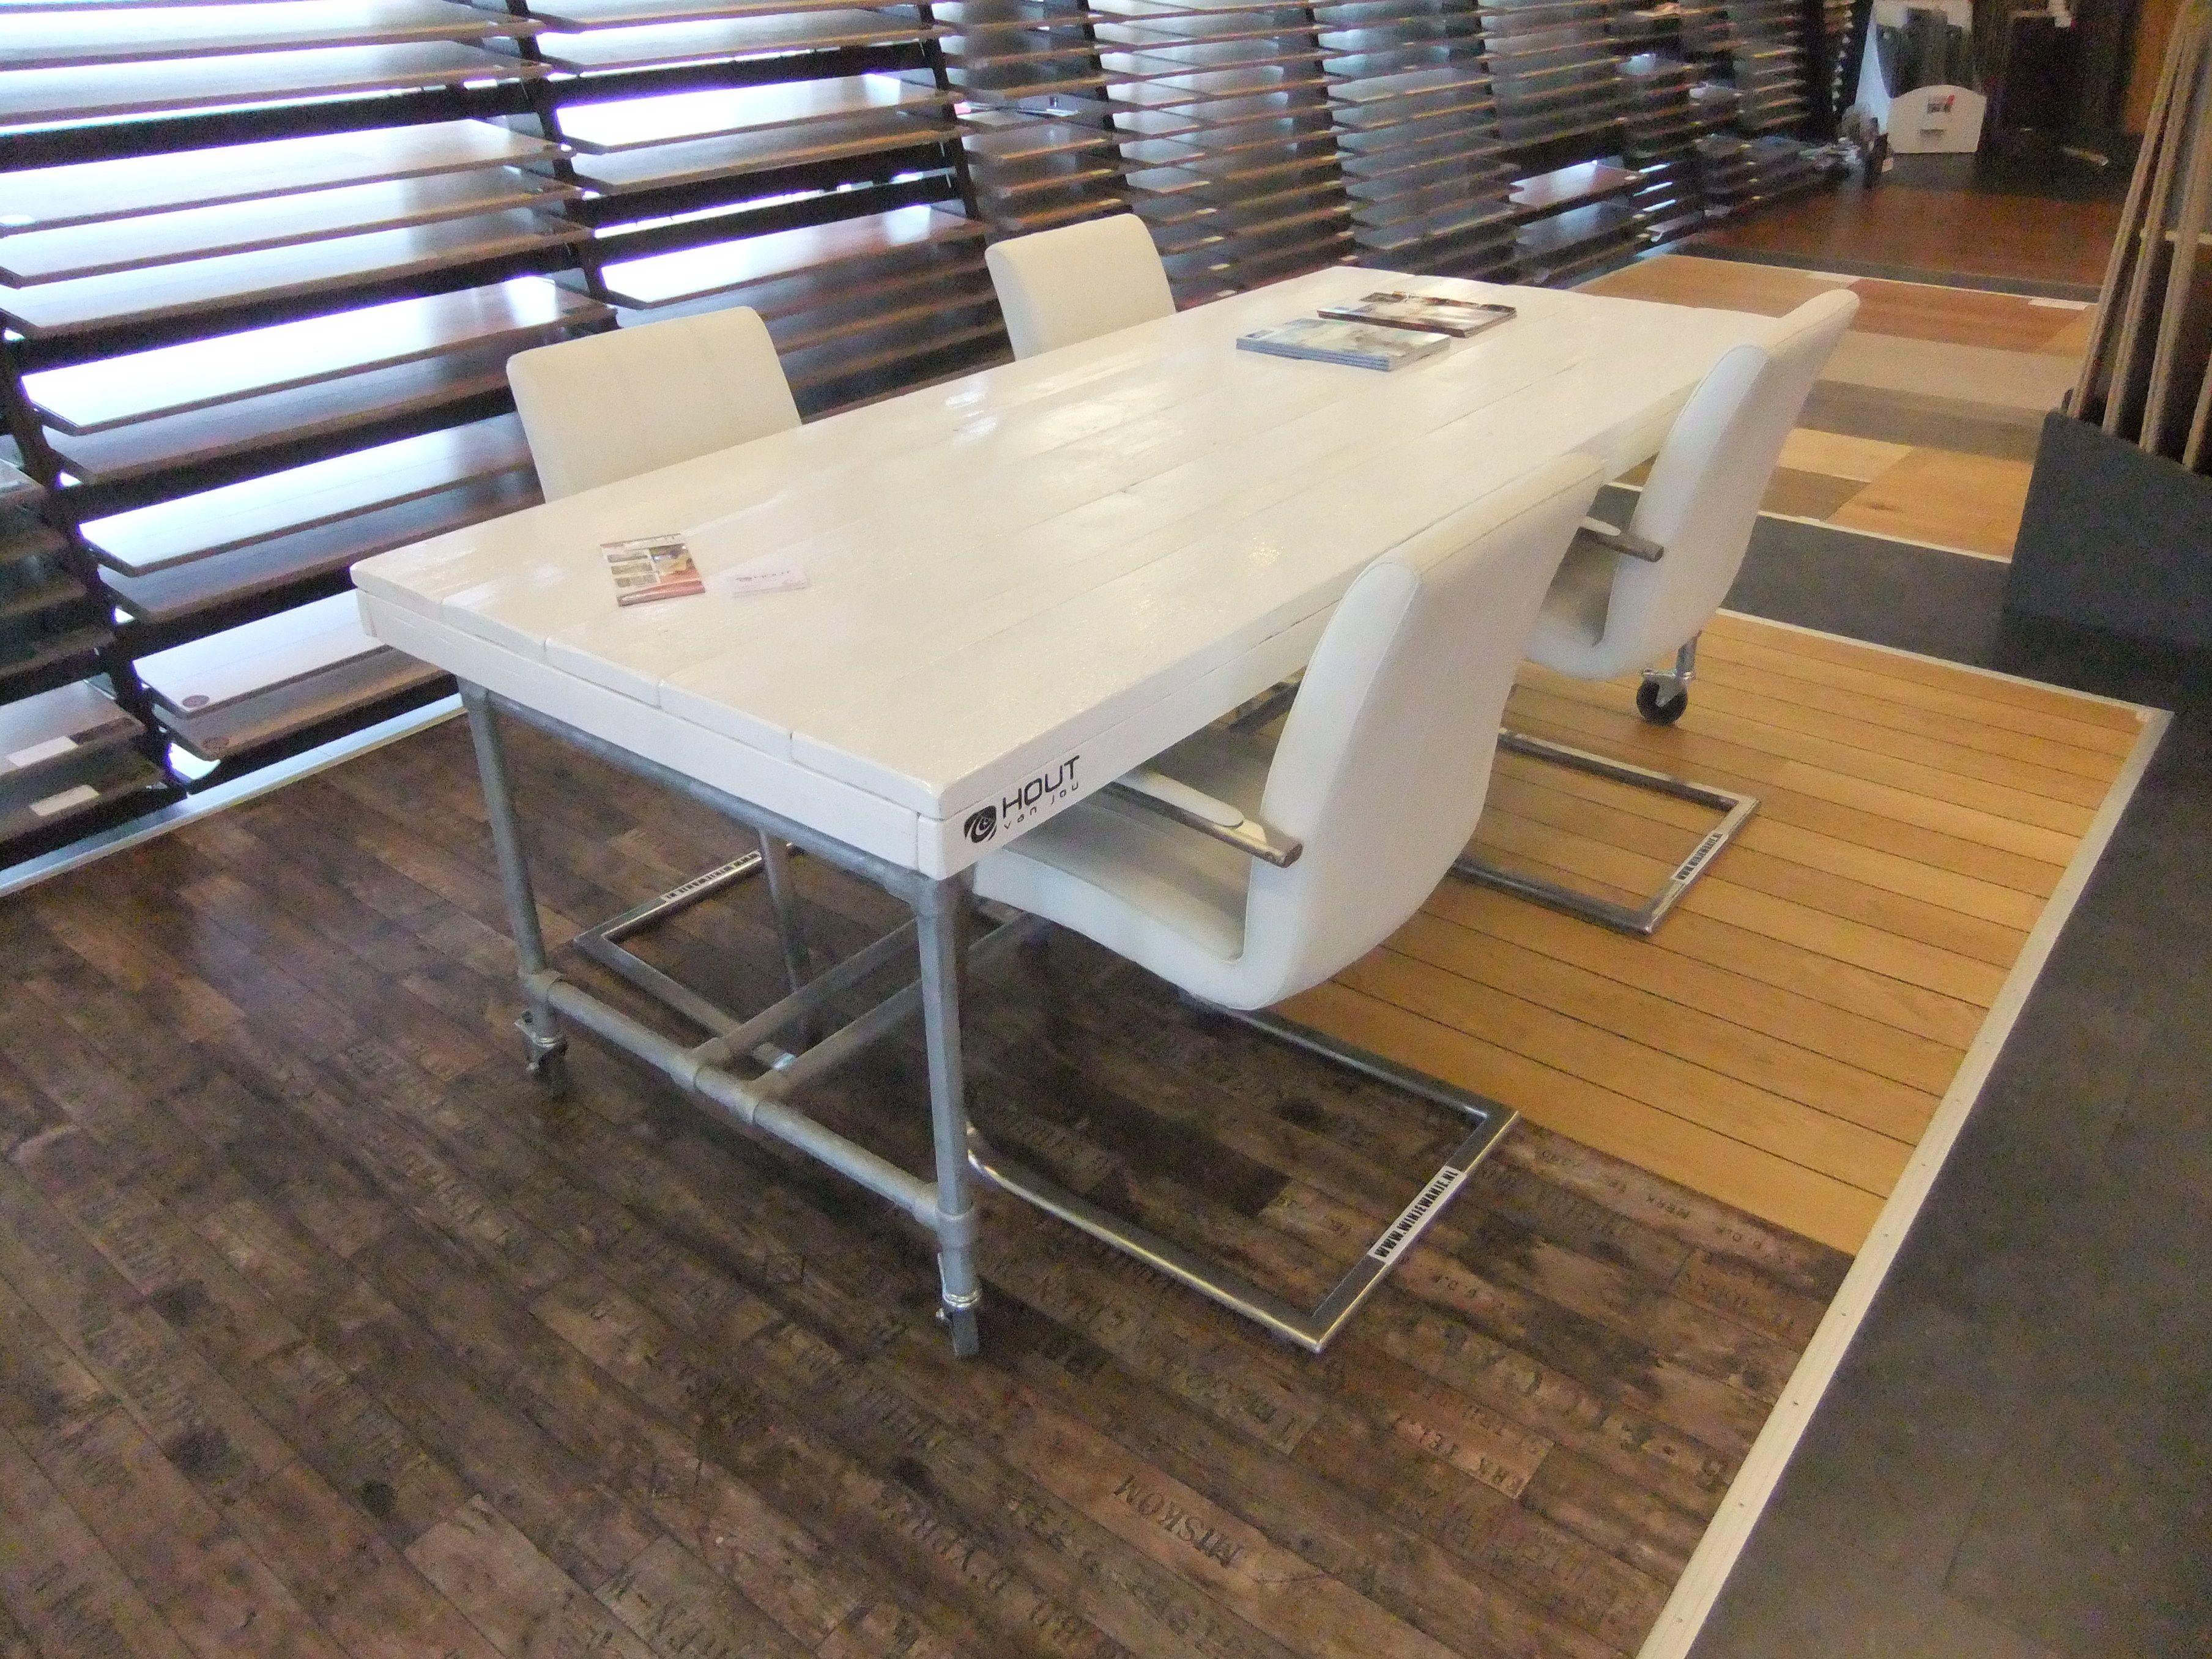 Hoogglans Witte Tafel : Tafel van steigerhout met stalenbuizen frame type croomer tafel